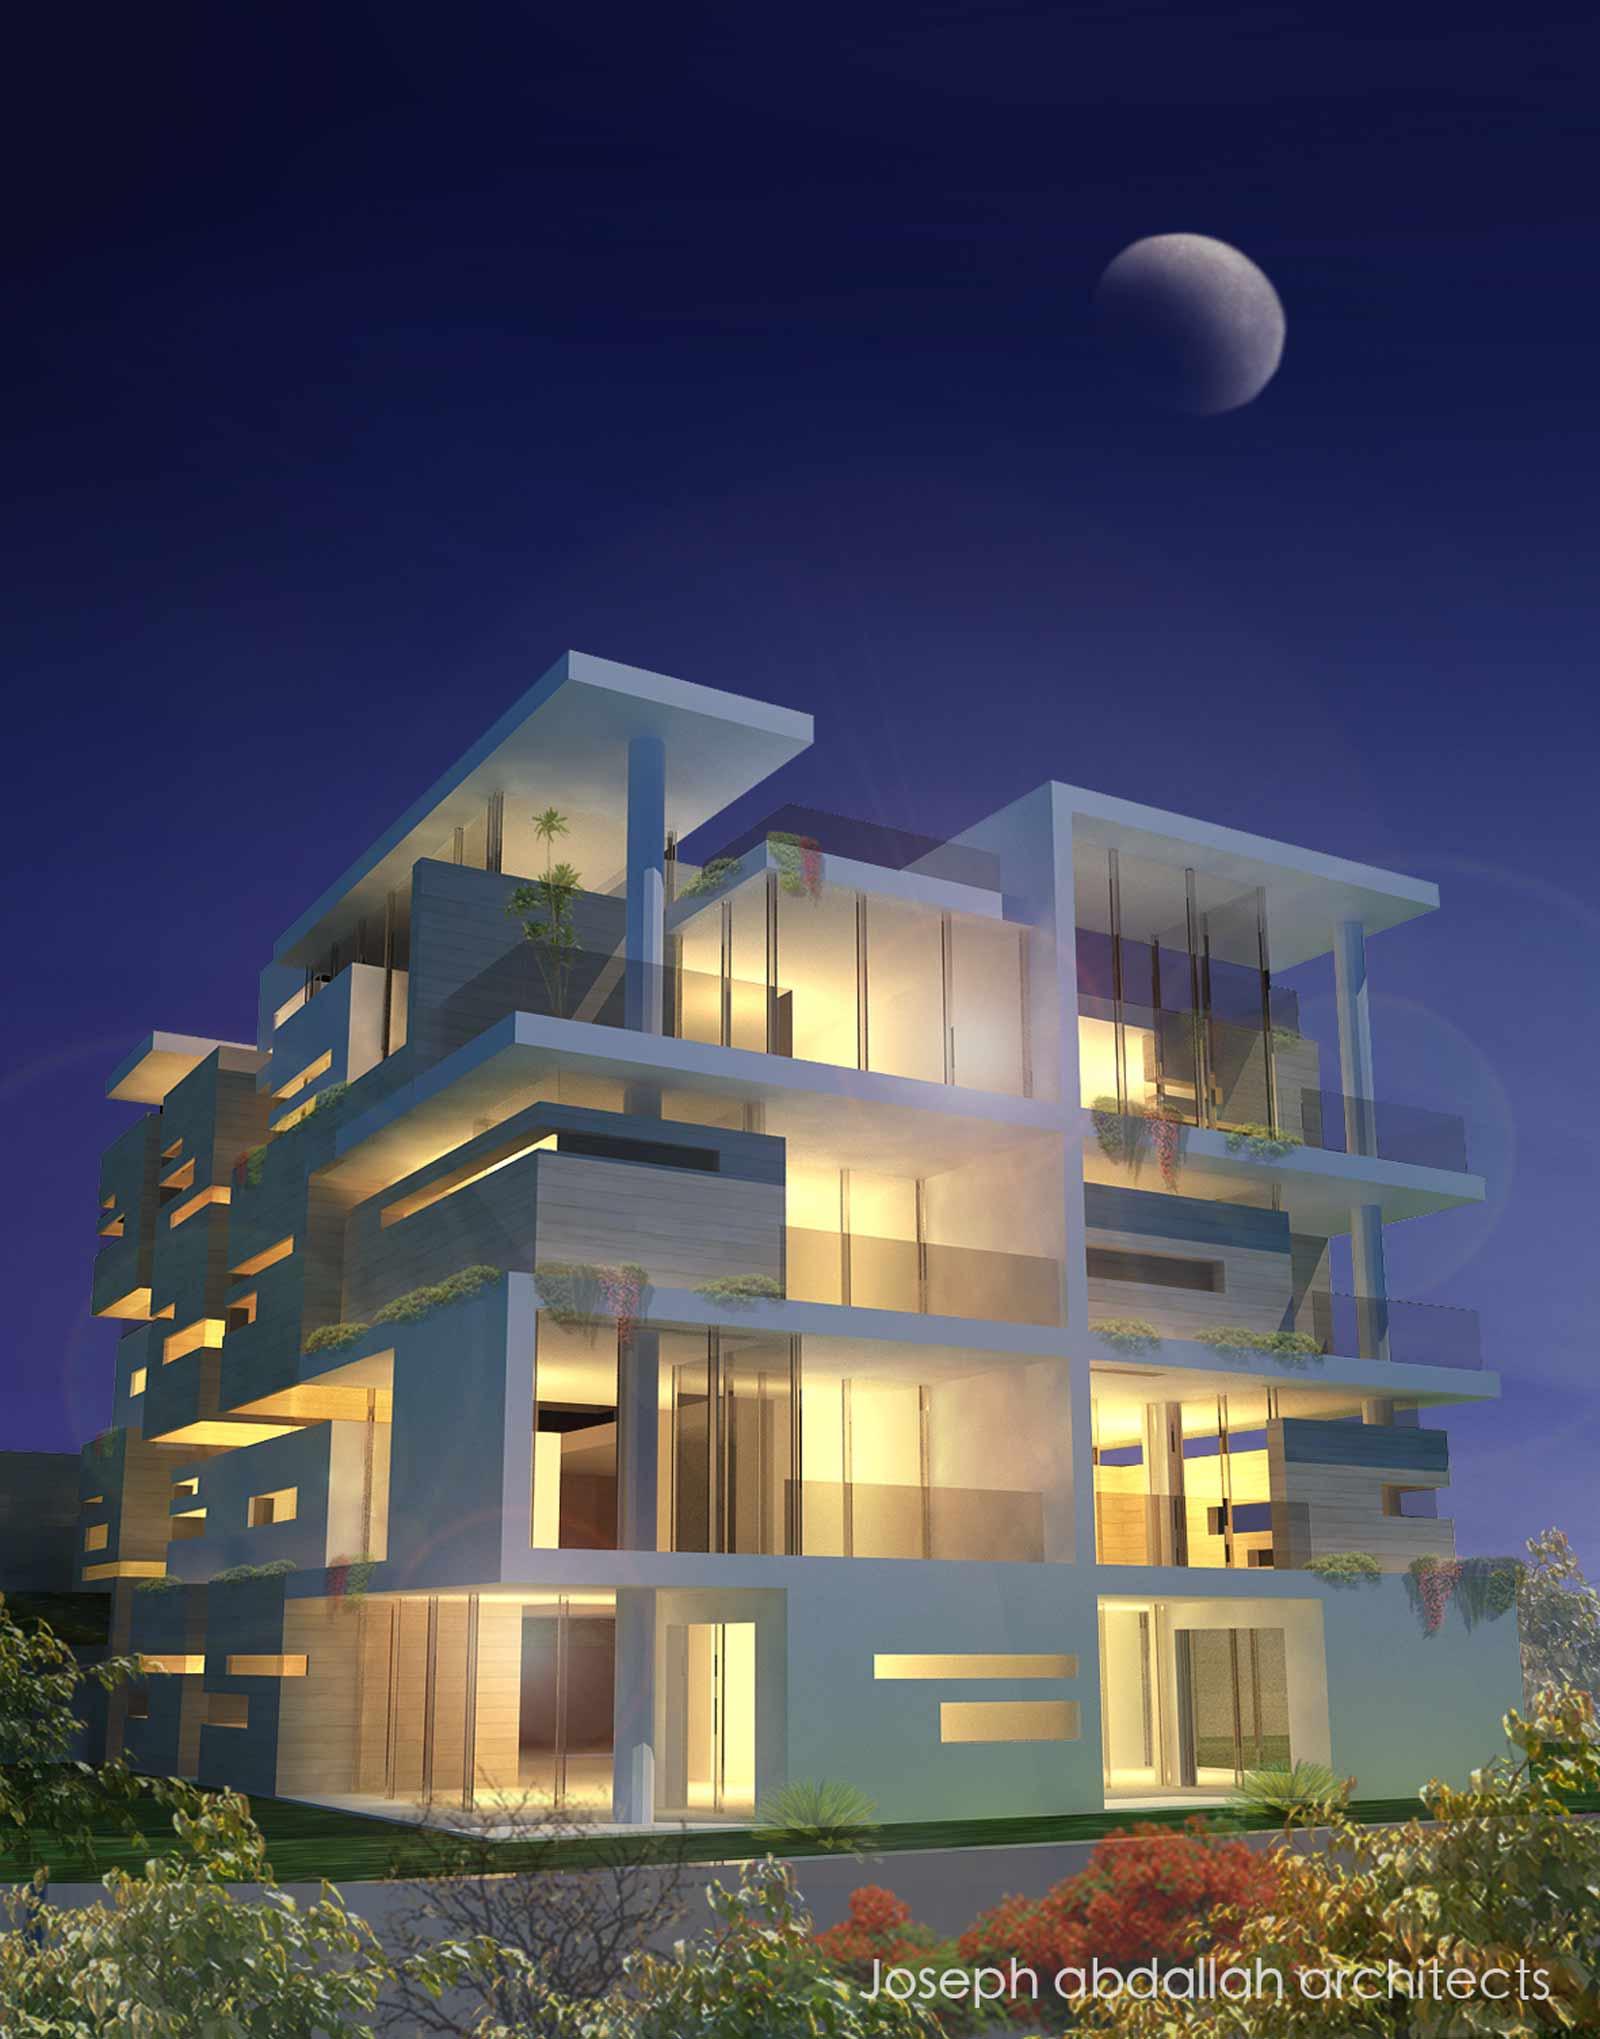 residence-building-modern-architecture-lebanon-joseph-abdallah-architects-4